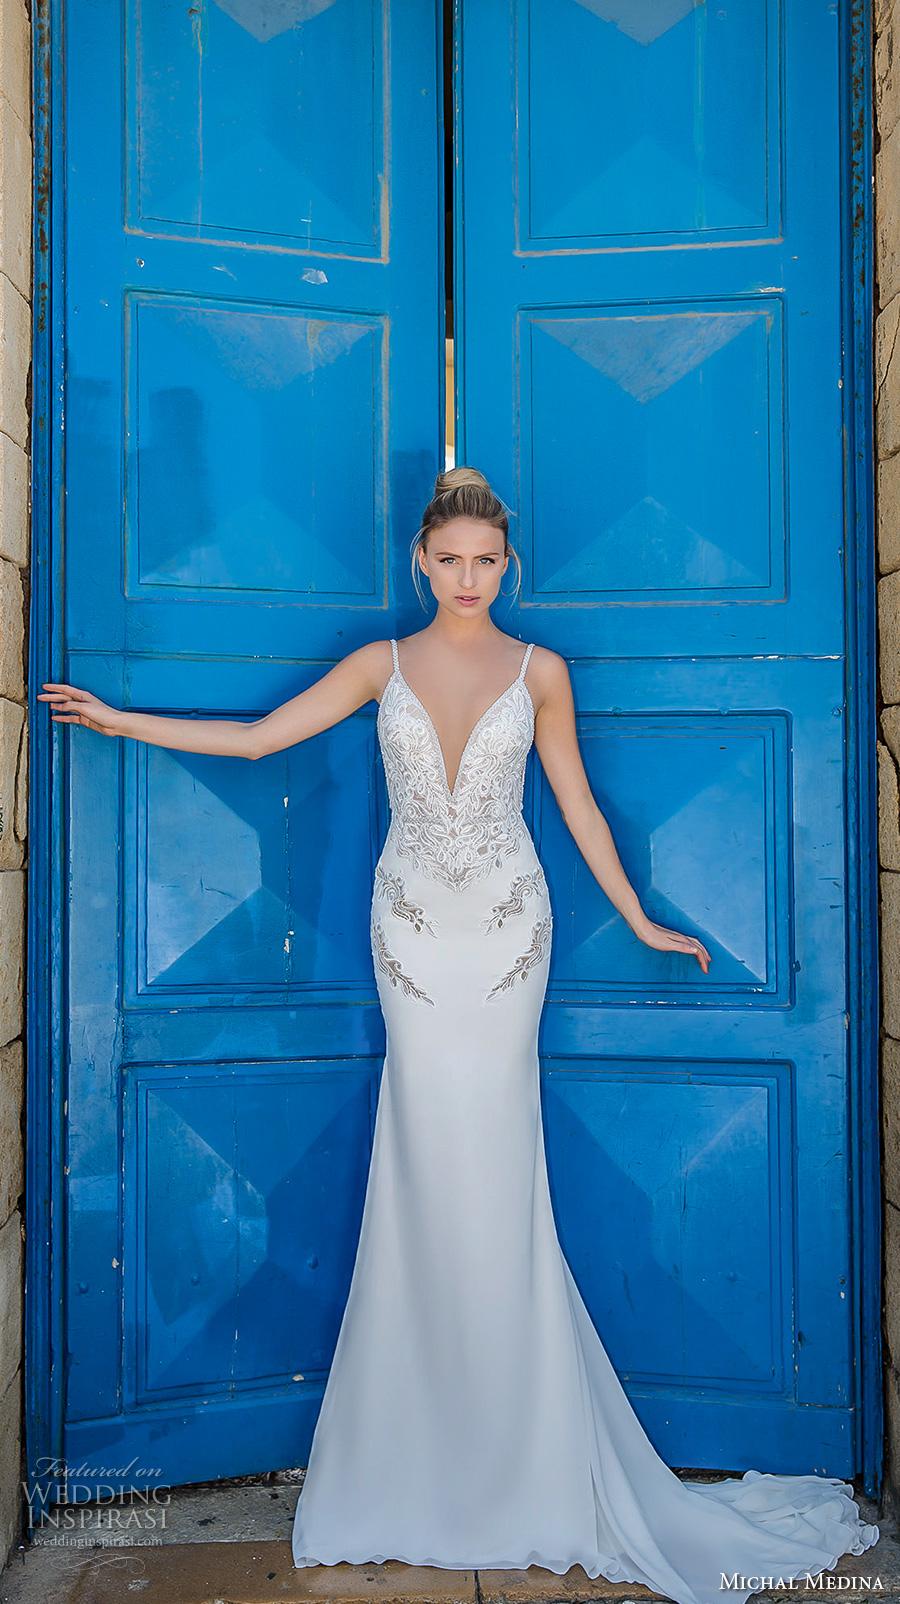 michal medina 2017 bridal spagetti strap neck deep pluning sweetheart neckline heavily embellished bodice sheath wedding dress chapel train (dianne) mv